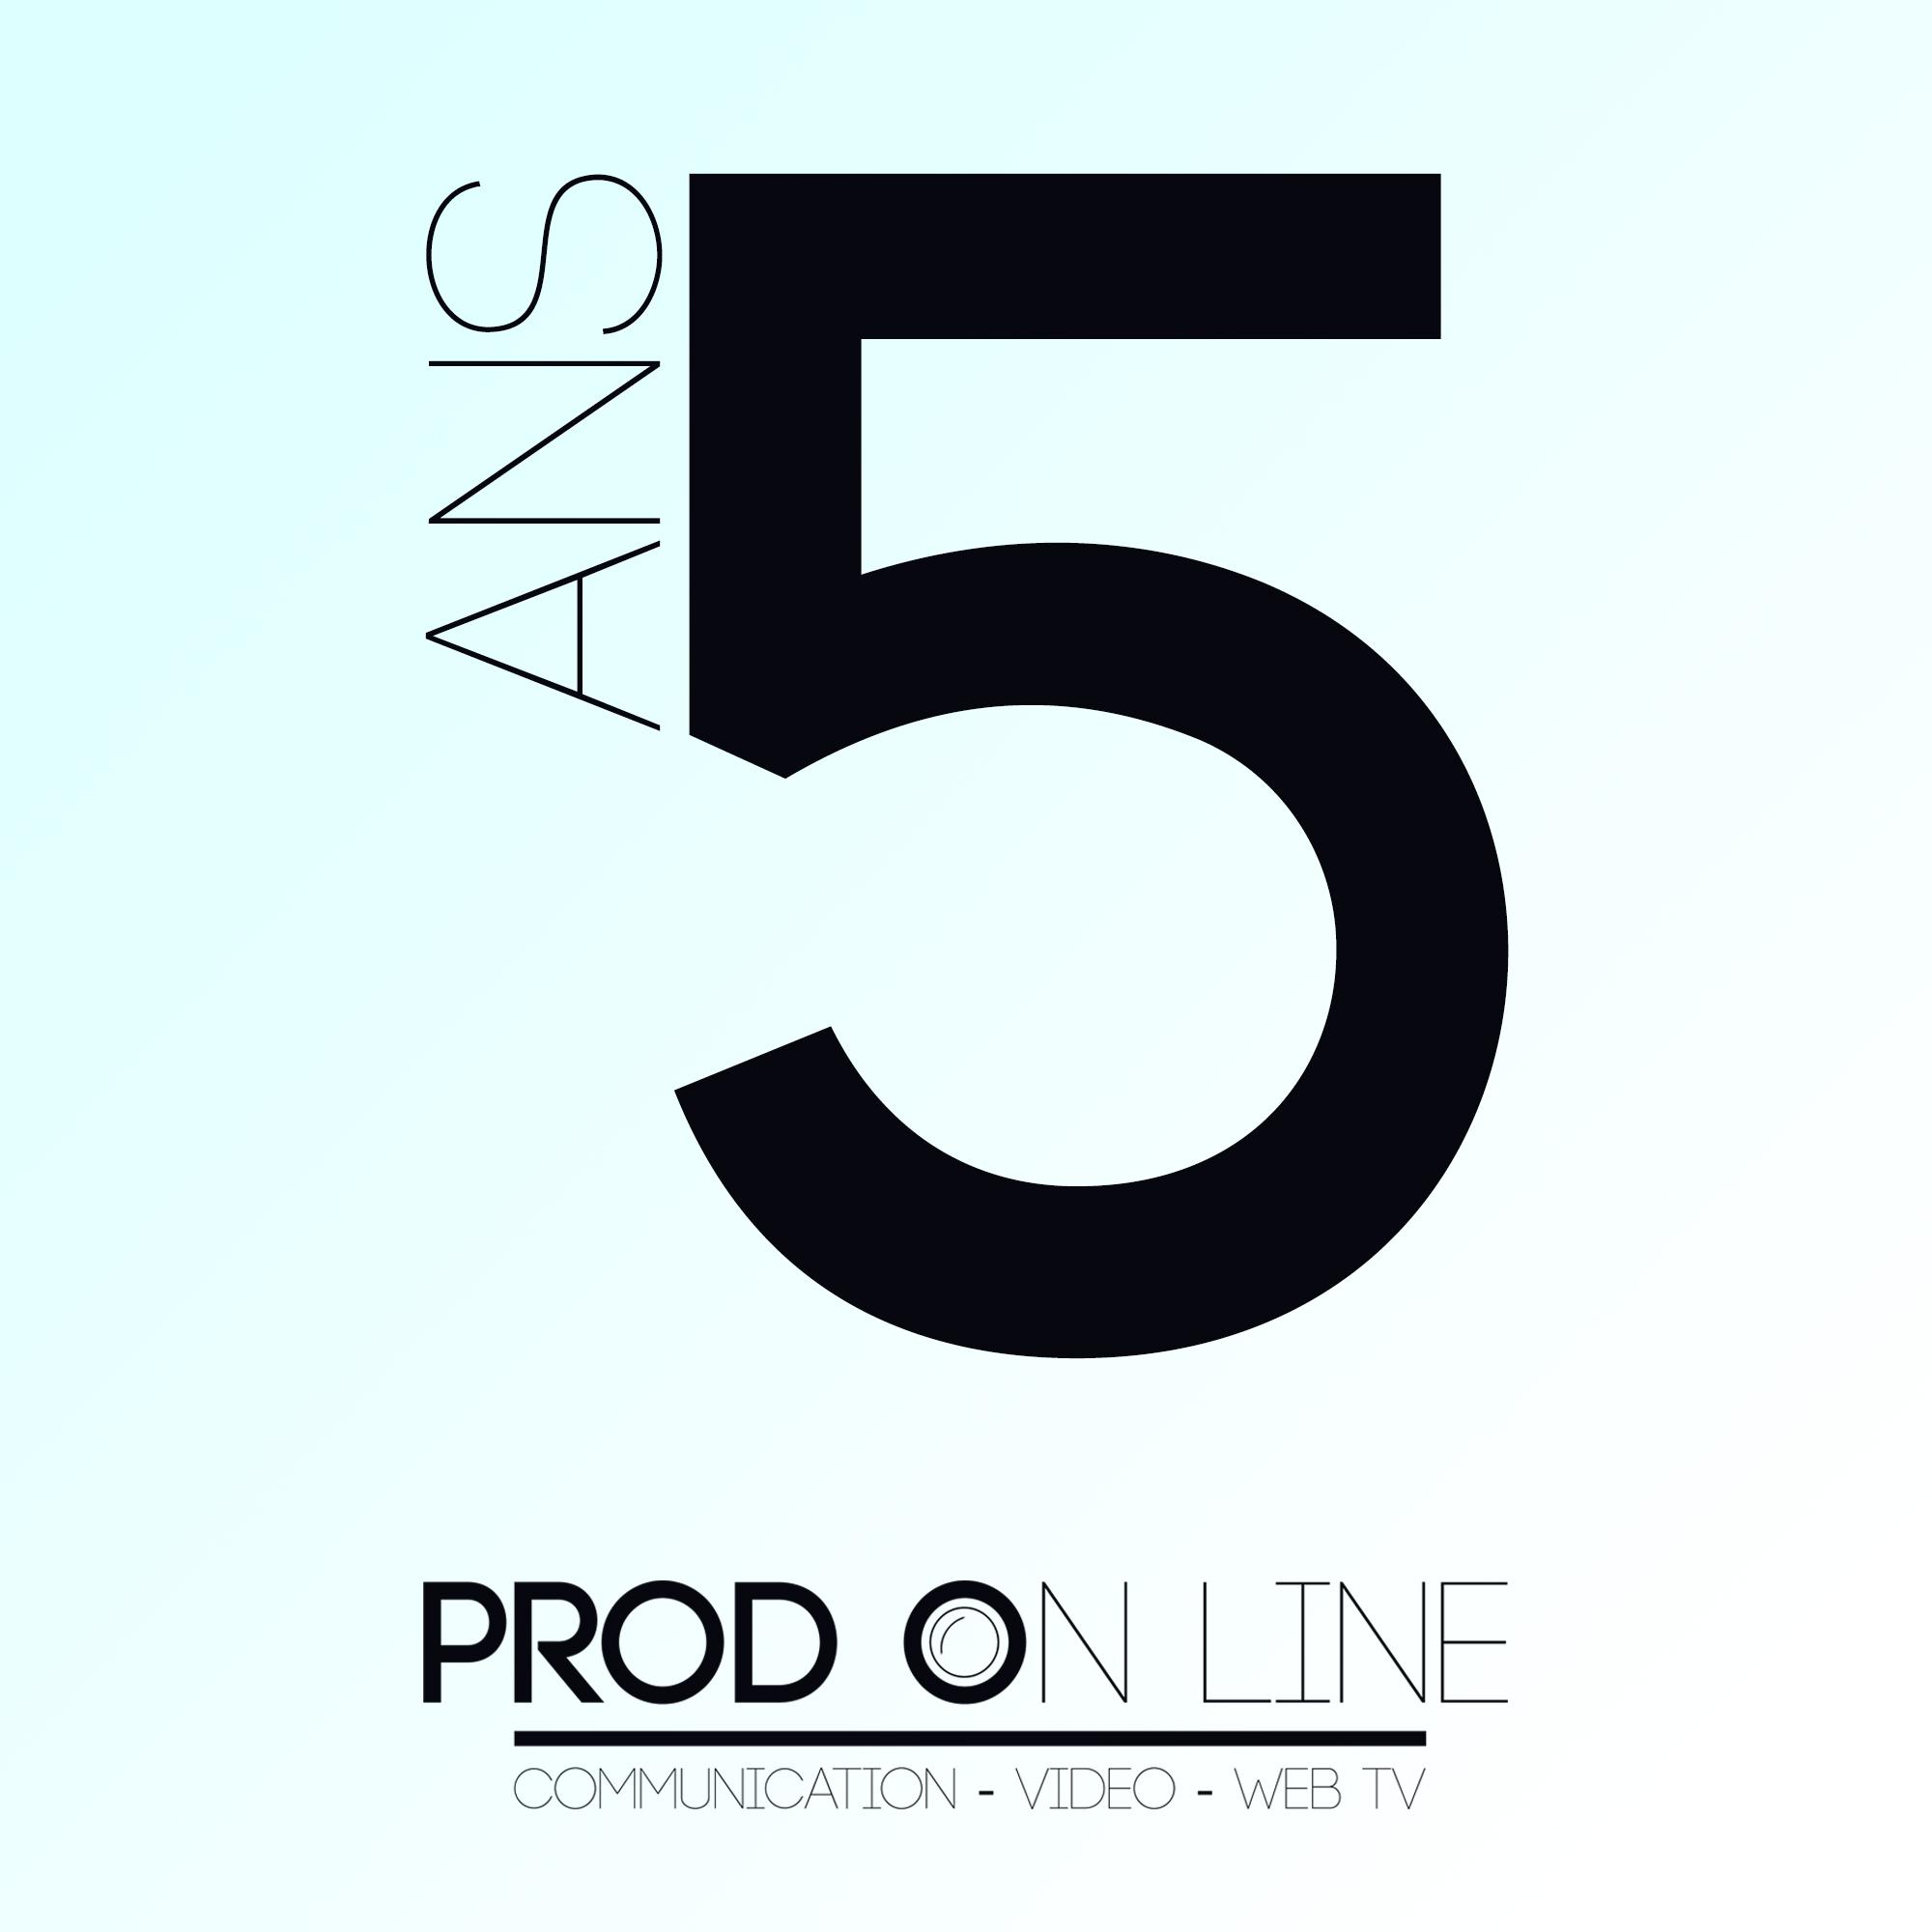 Prod On Line fête ses 5 ans !